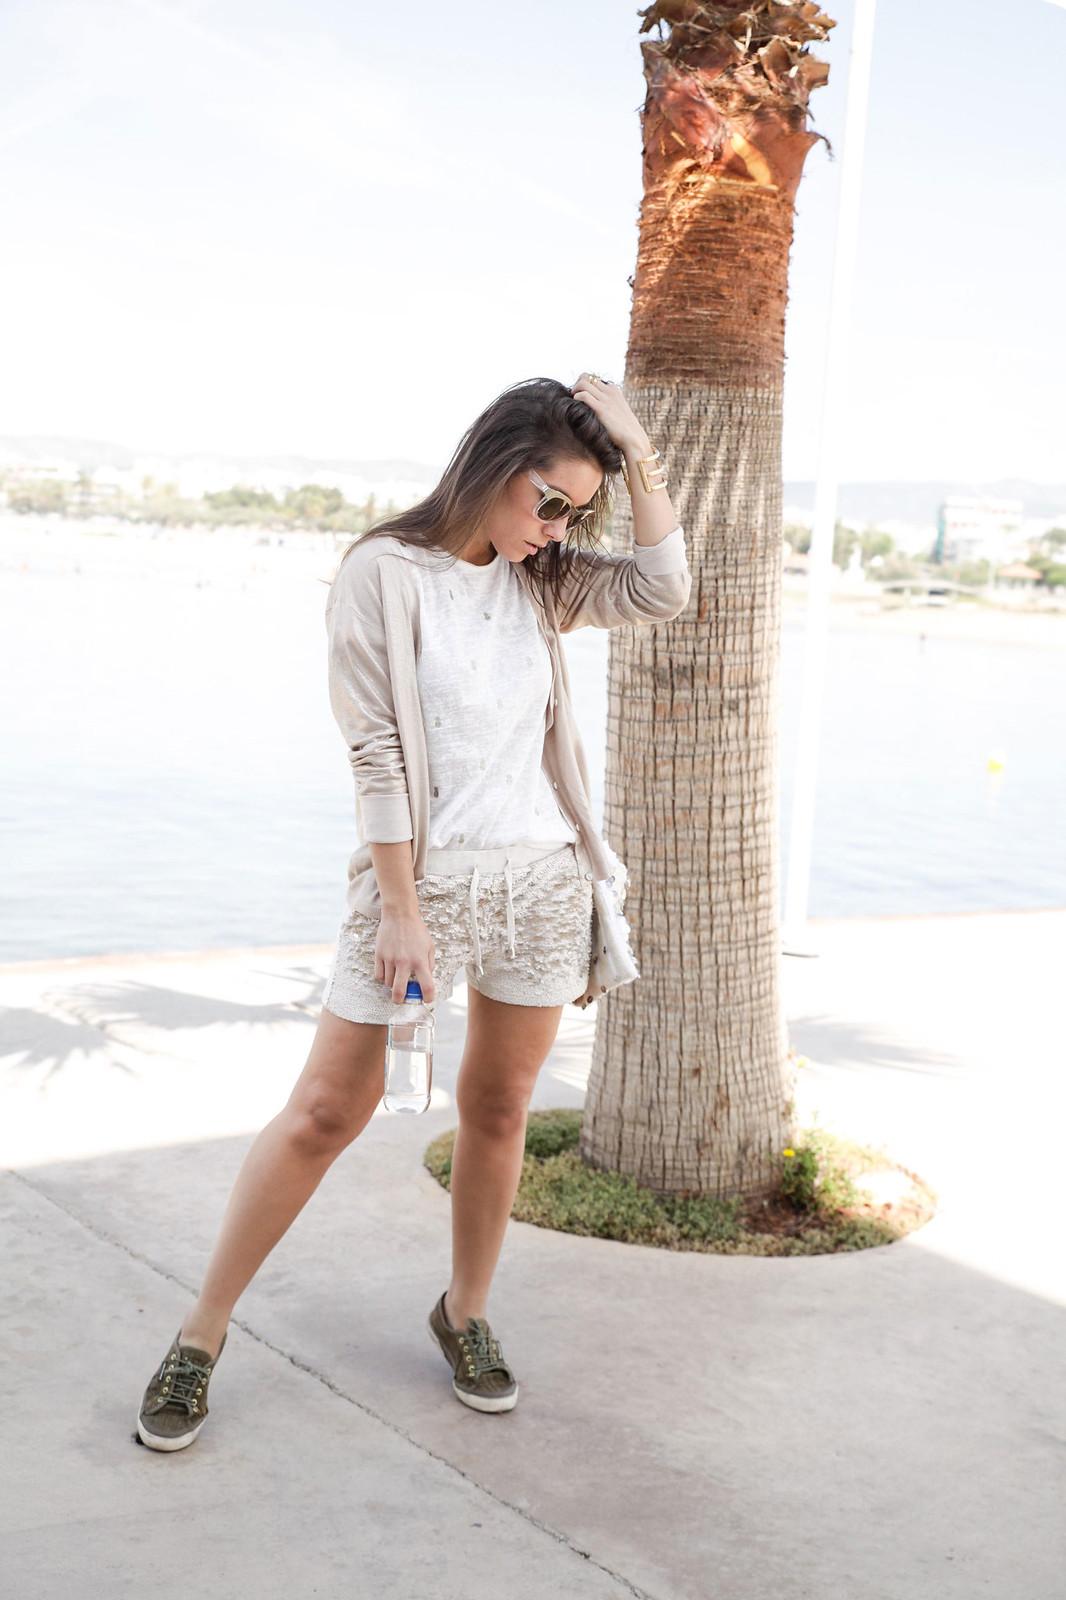 04_Shorts_lentejuelas_dorados_outfit_lelyjane_gold_shorts_theguetsgirl_laura_santolaria_influencer_barcelona_style